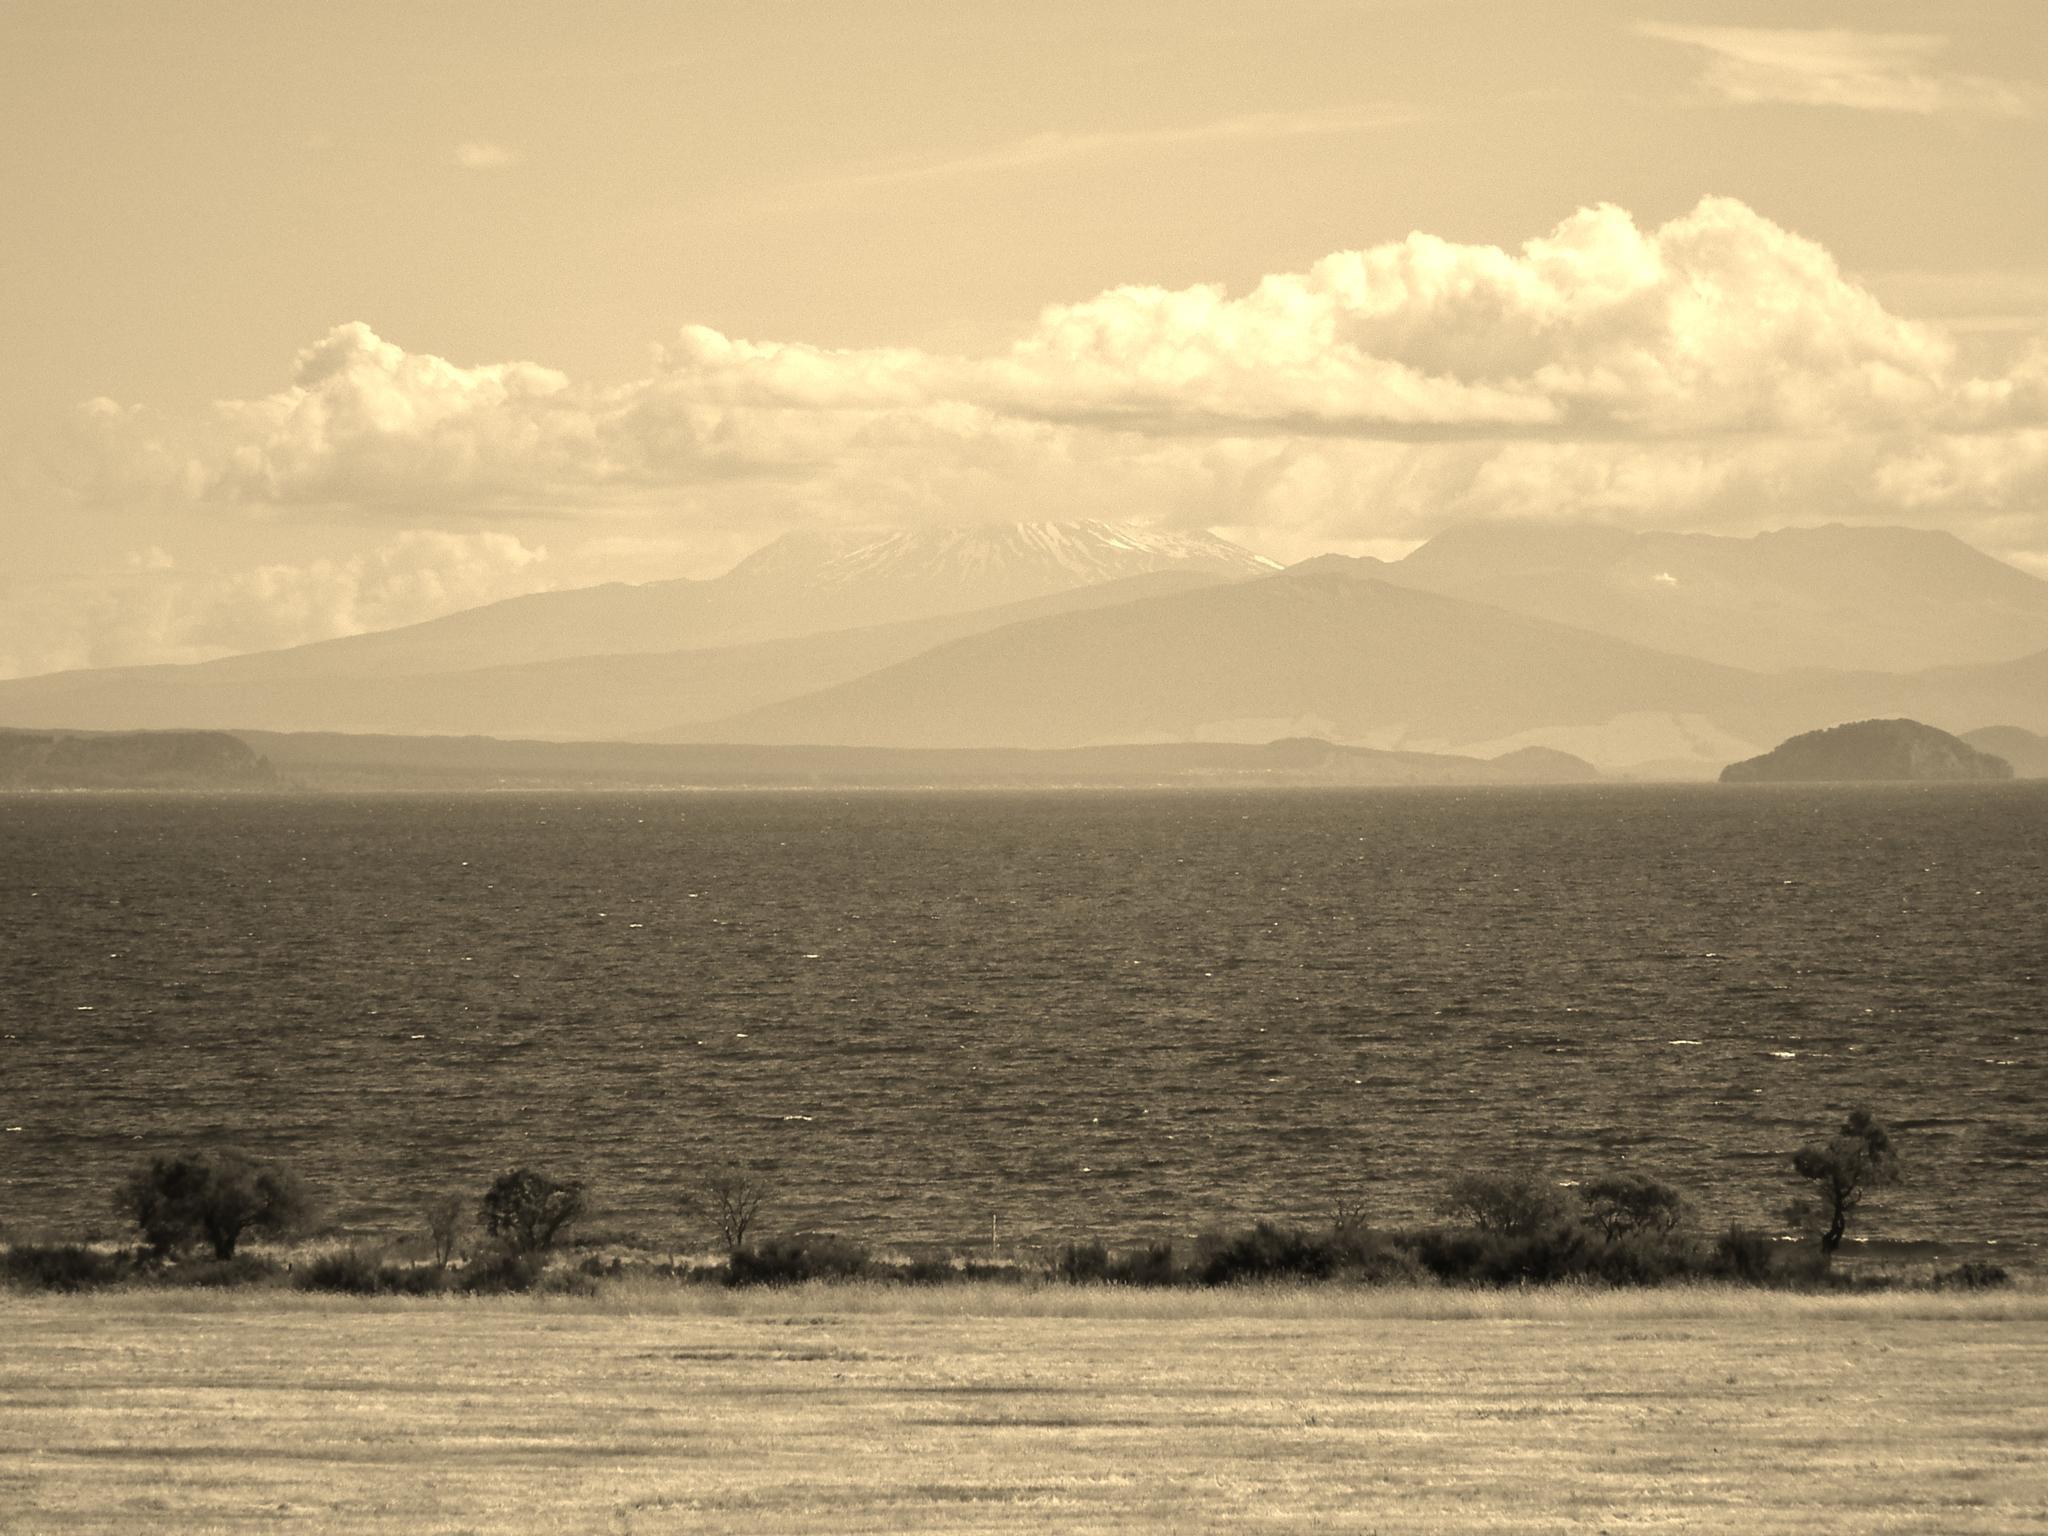 Taupo and Tongariro by andy.morrow.315